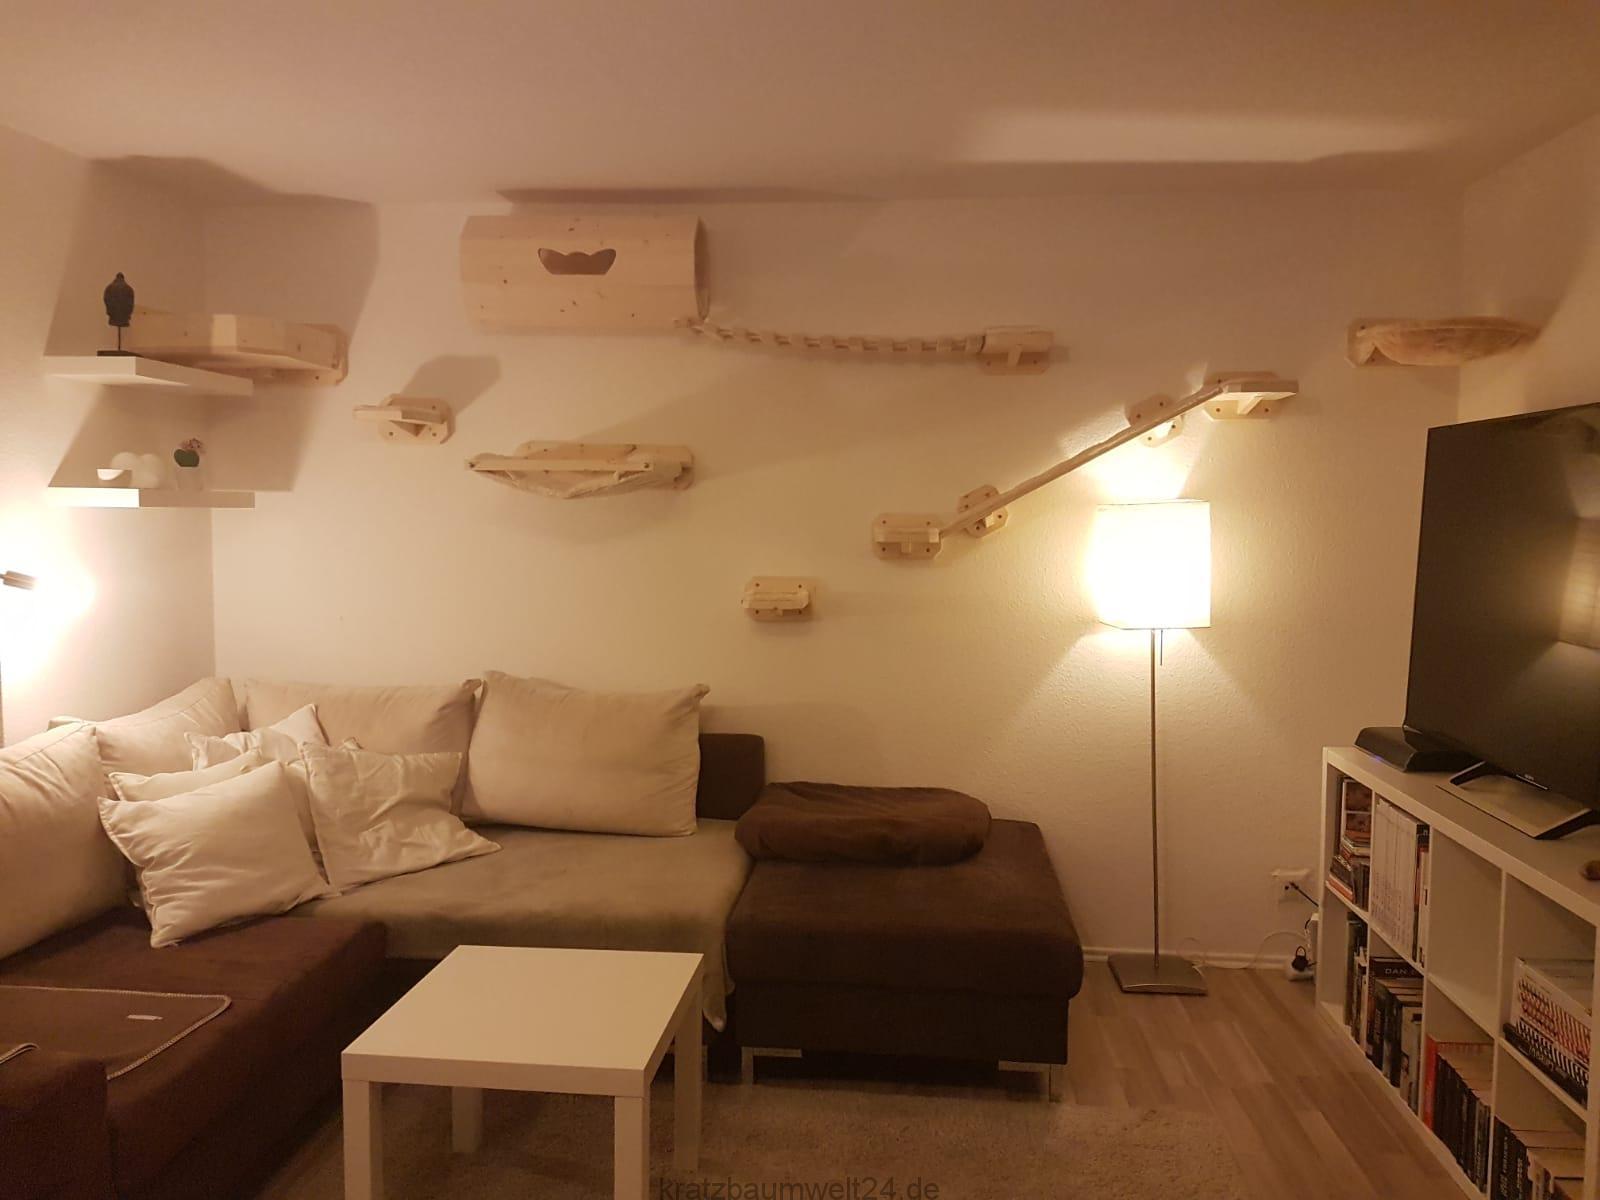 wandkratzbaum catwalk f r katzen kletterparadies f r. Black Bedroom Furniture Sets. Home Design Ideas